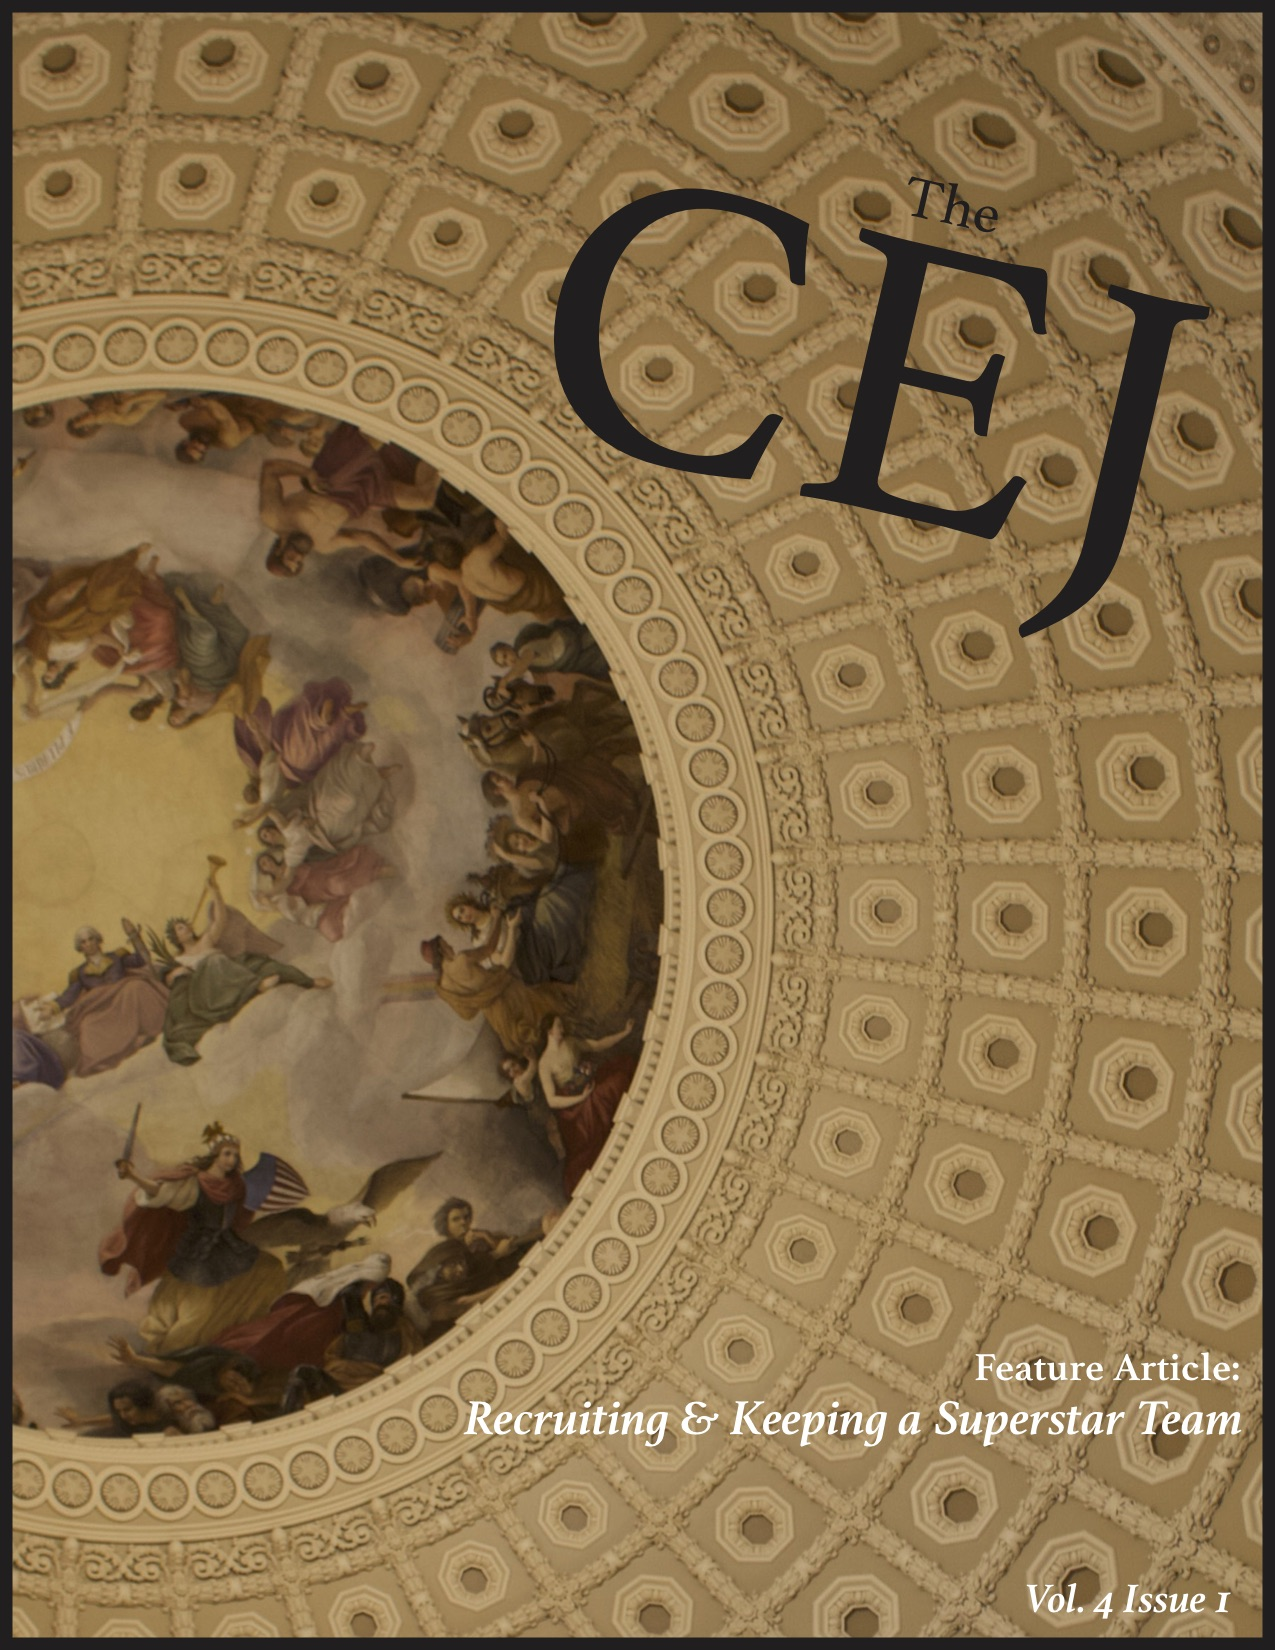 The CEJ (Vol 4 issue 1)